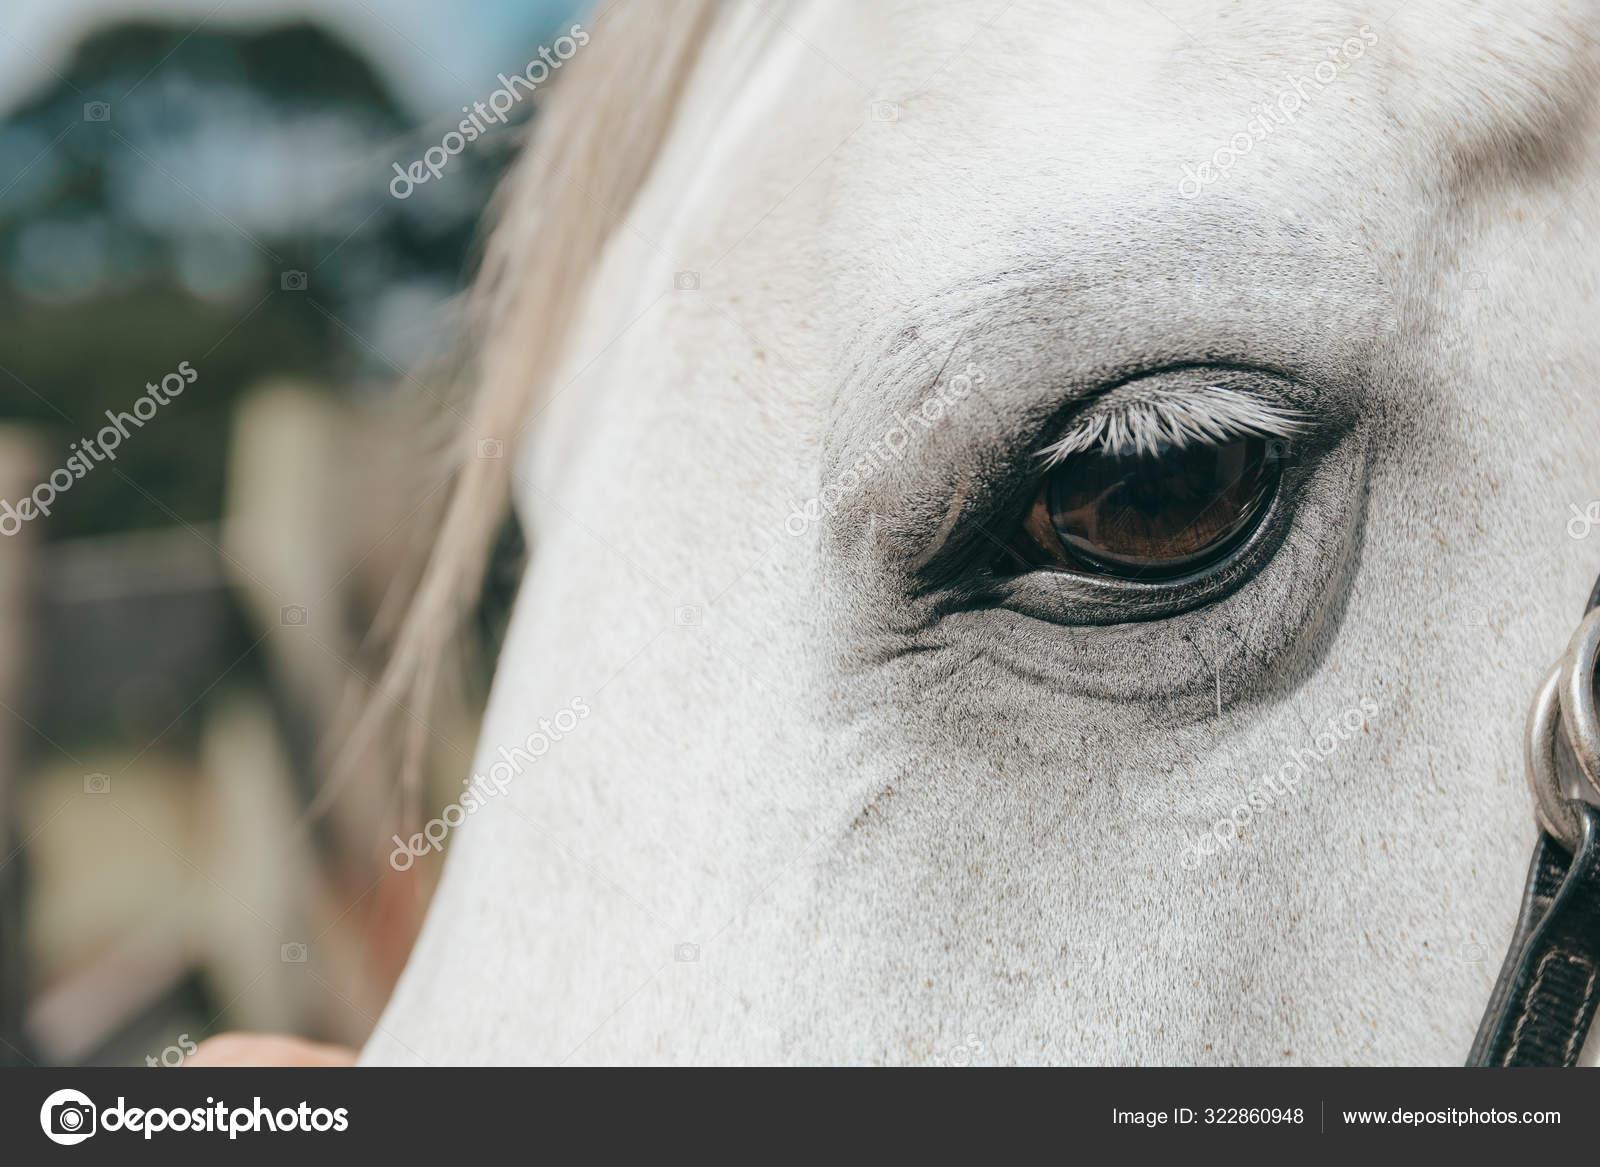 Eye Of A White Horse Stock Photo C Adrirodri Gar 322860948